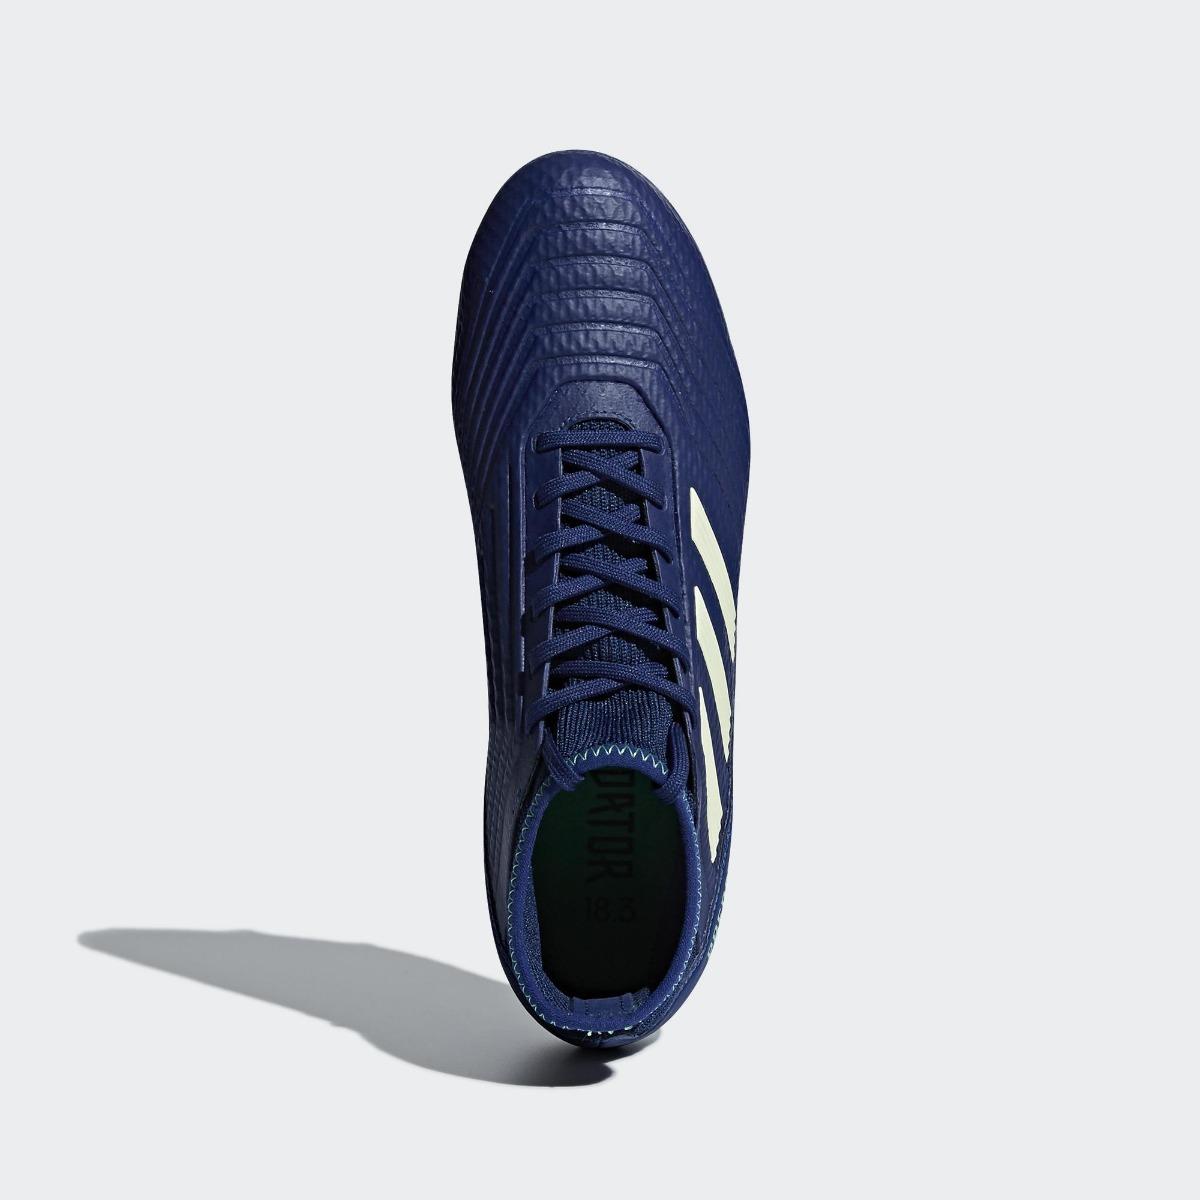 66dfeccbb3875 botin futbol 11 adidas predator nuevos calidad 18.3. Cargando zoom.